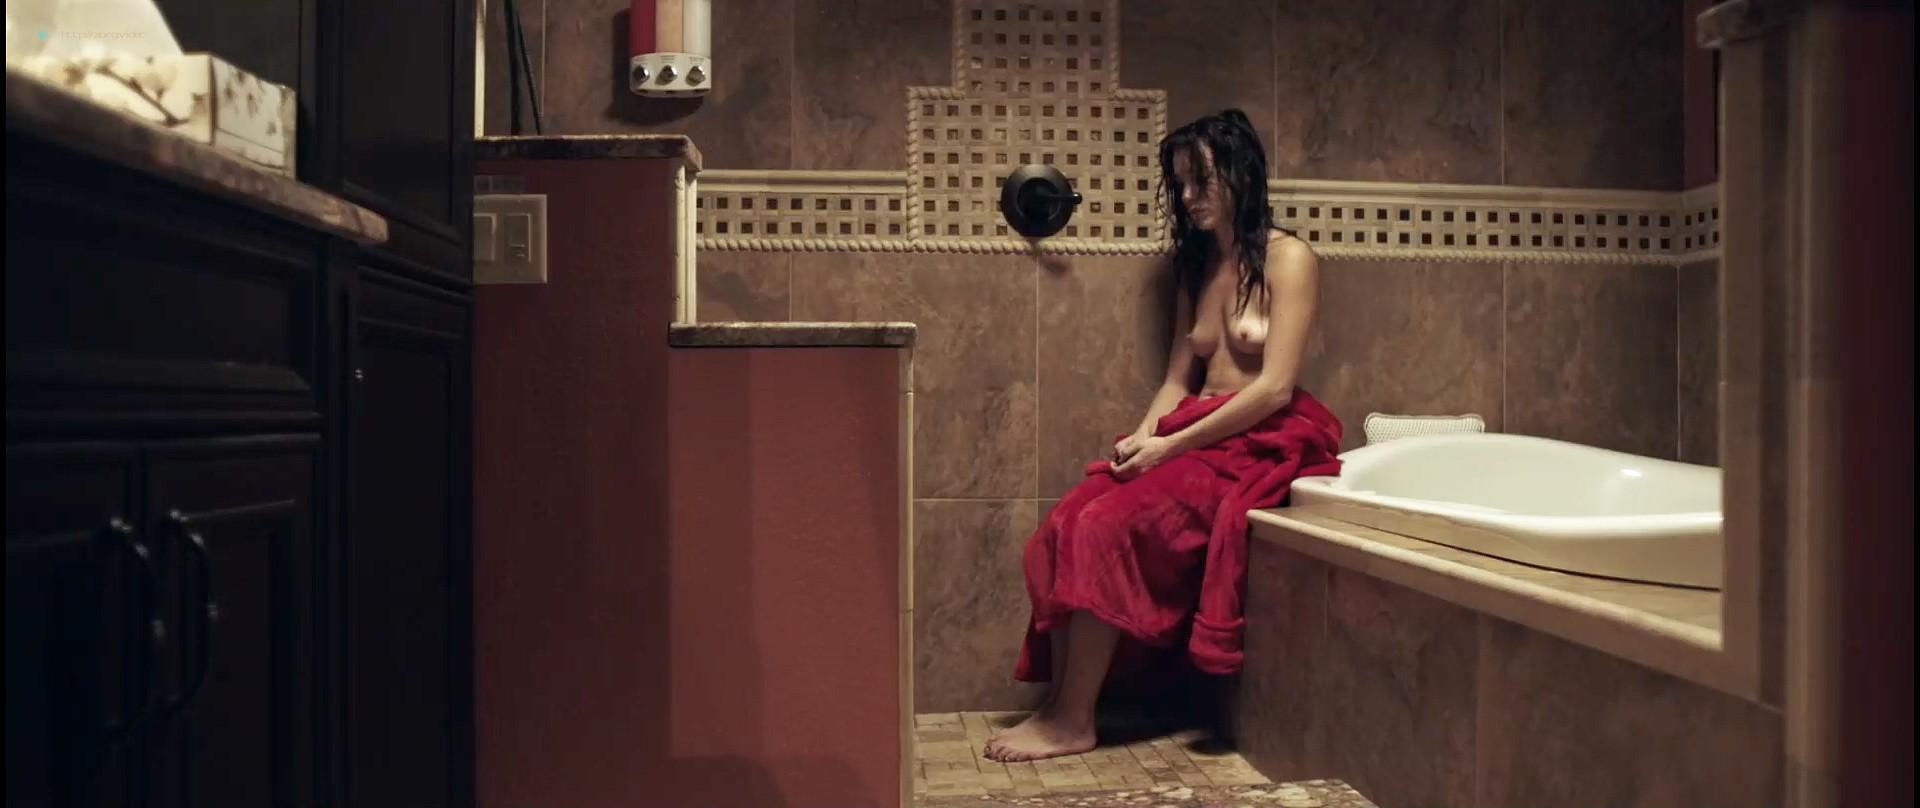 Jemma Dallender nude Rachel Rosenstein nude butt - The Executioners (2018) HD 1080p (10)